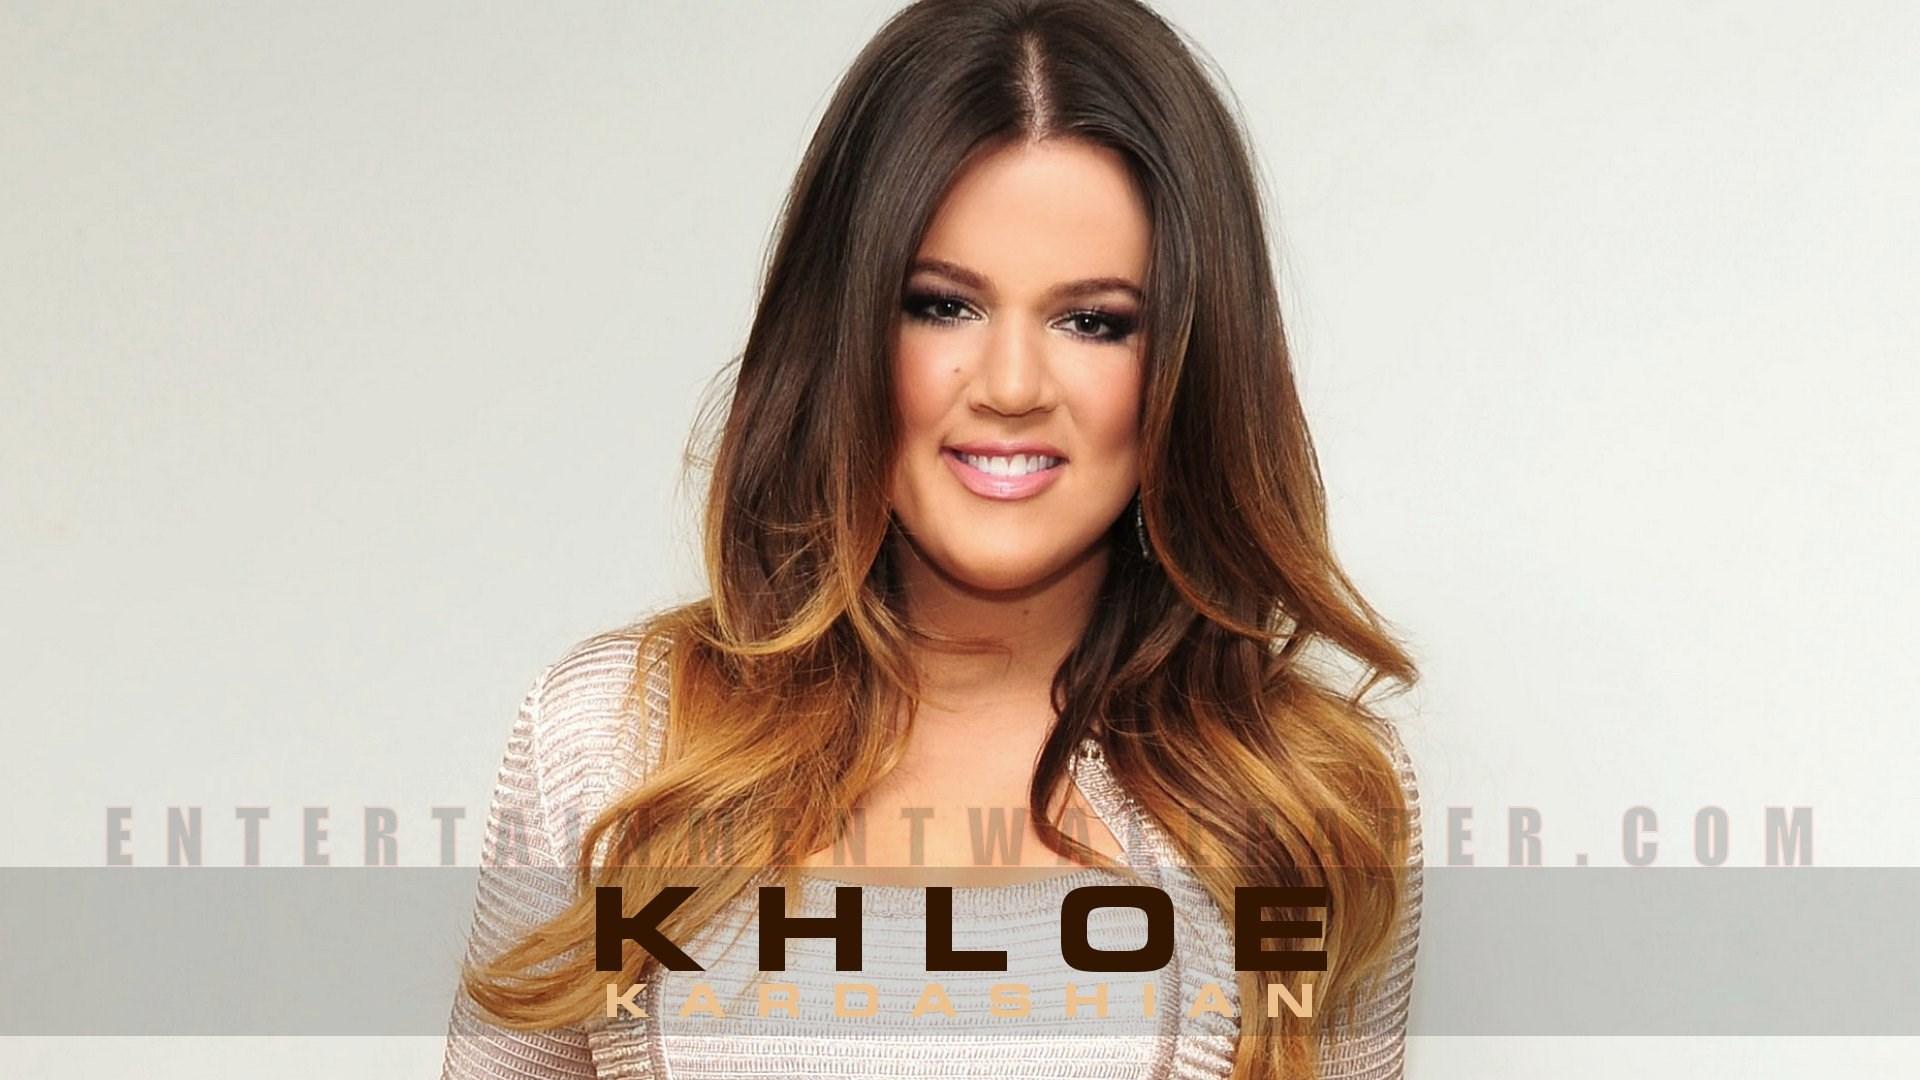 khloe-kardashian-free-hd-widescreen-1920-x-1080-kB-wallpaper-wp3407753